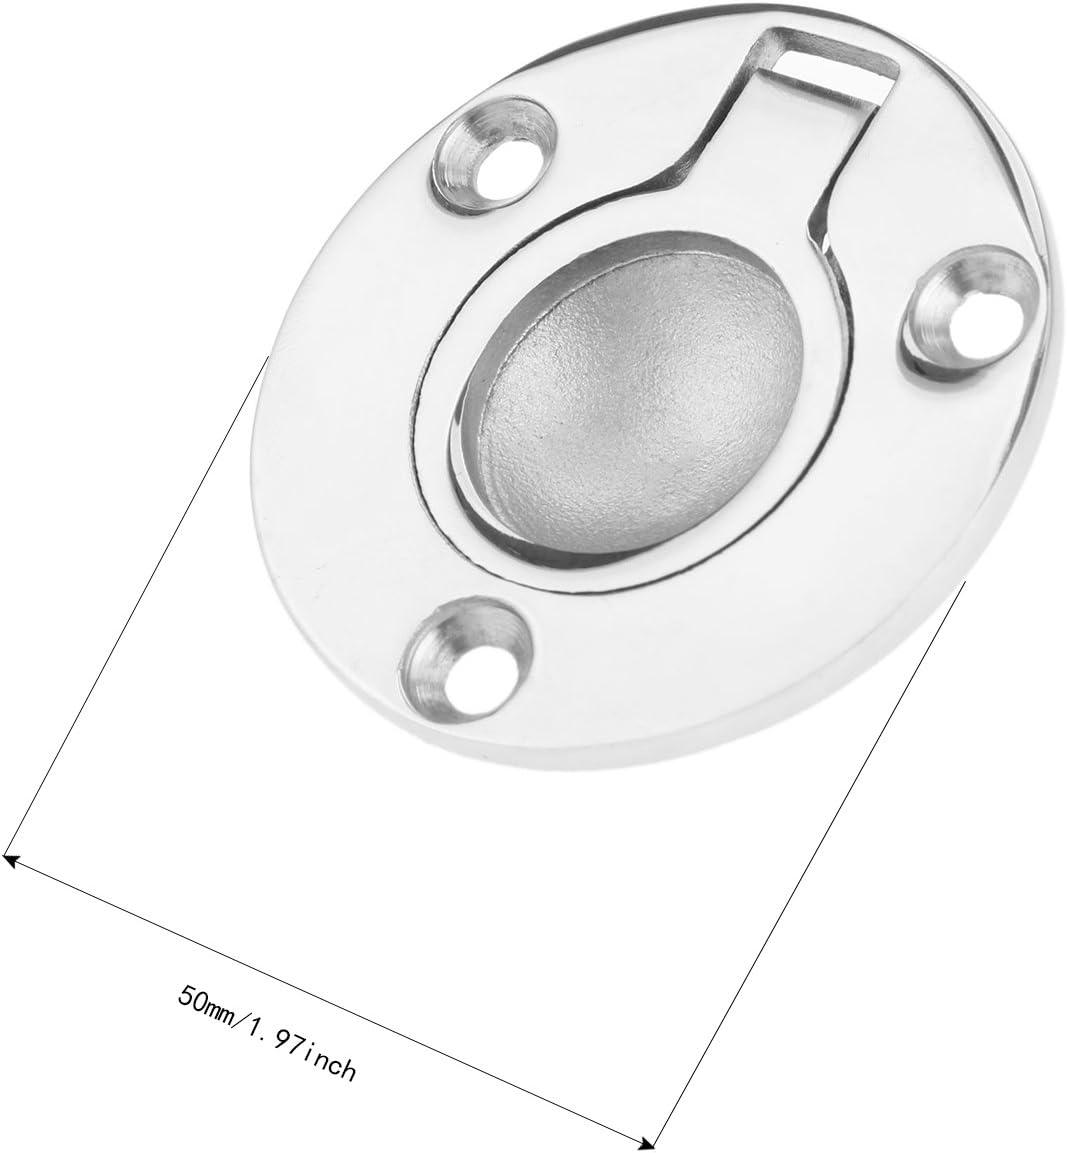 Mtsooning 4pcs Boat Hatch Handle Stainless Steel Round Pull Ring Latch Locker Flush 1.97 Locker Marine Yacht Cabinet Pull Lift